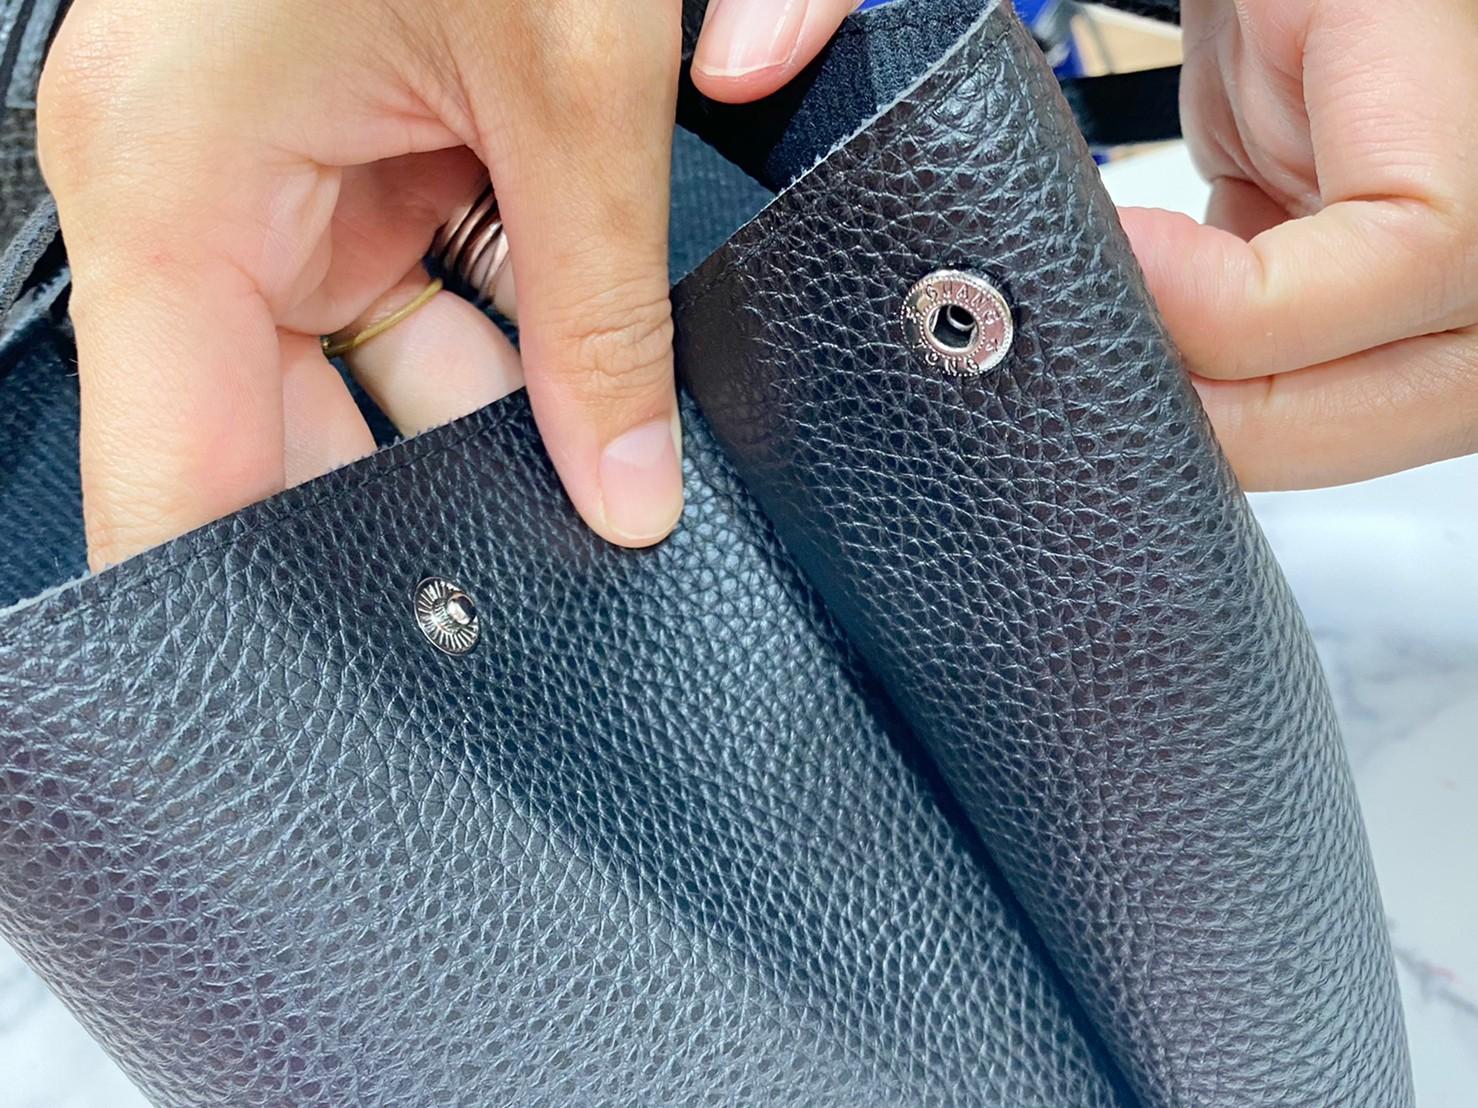 『egロゴトートバッグ』スナップボタンの画像